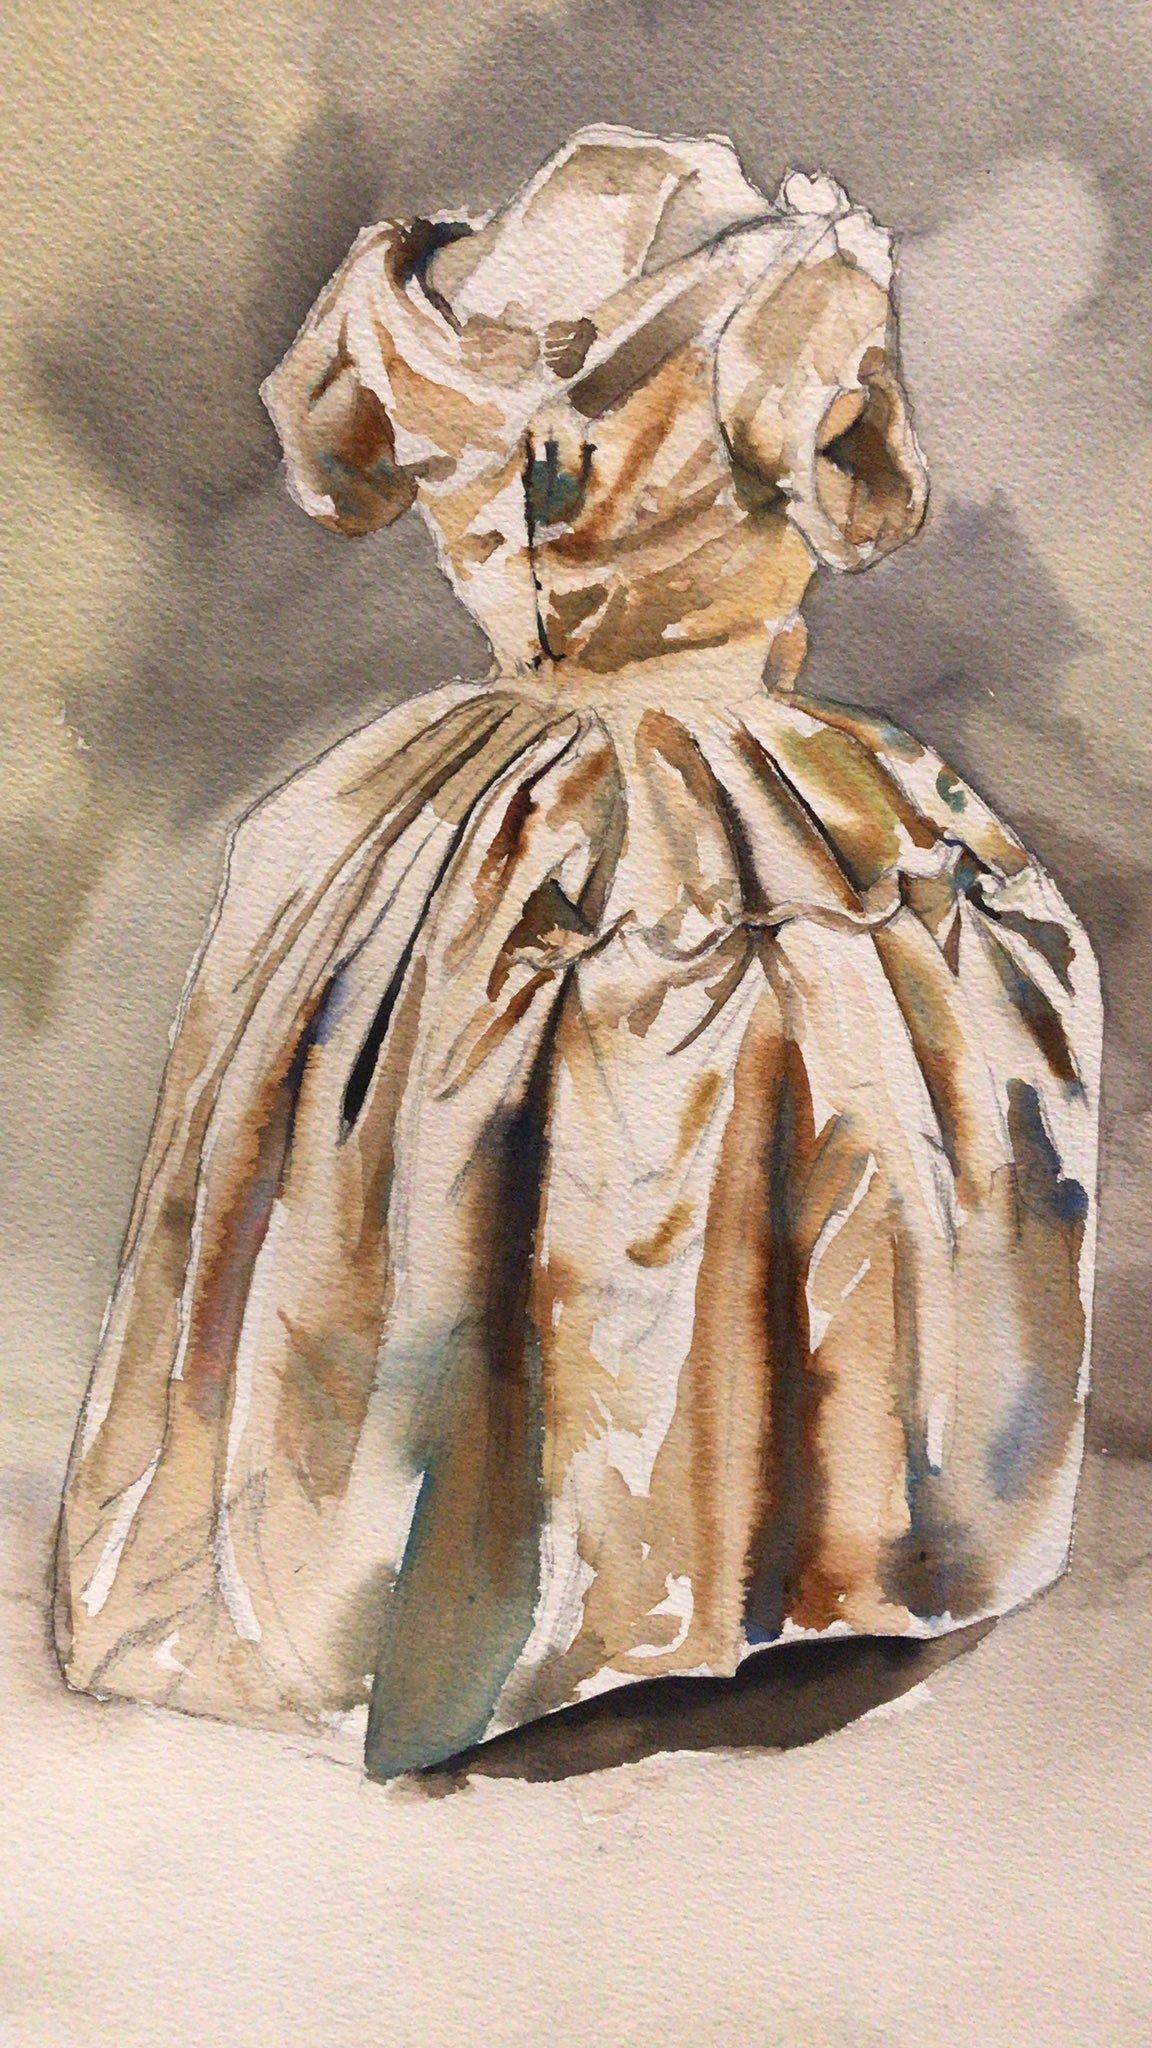 Image of Gold Dress - Print